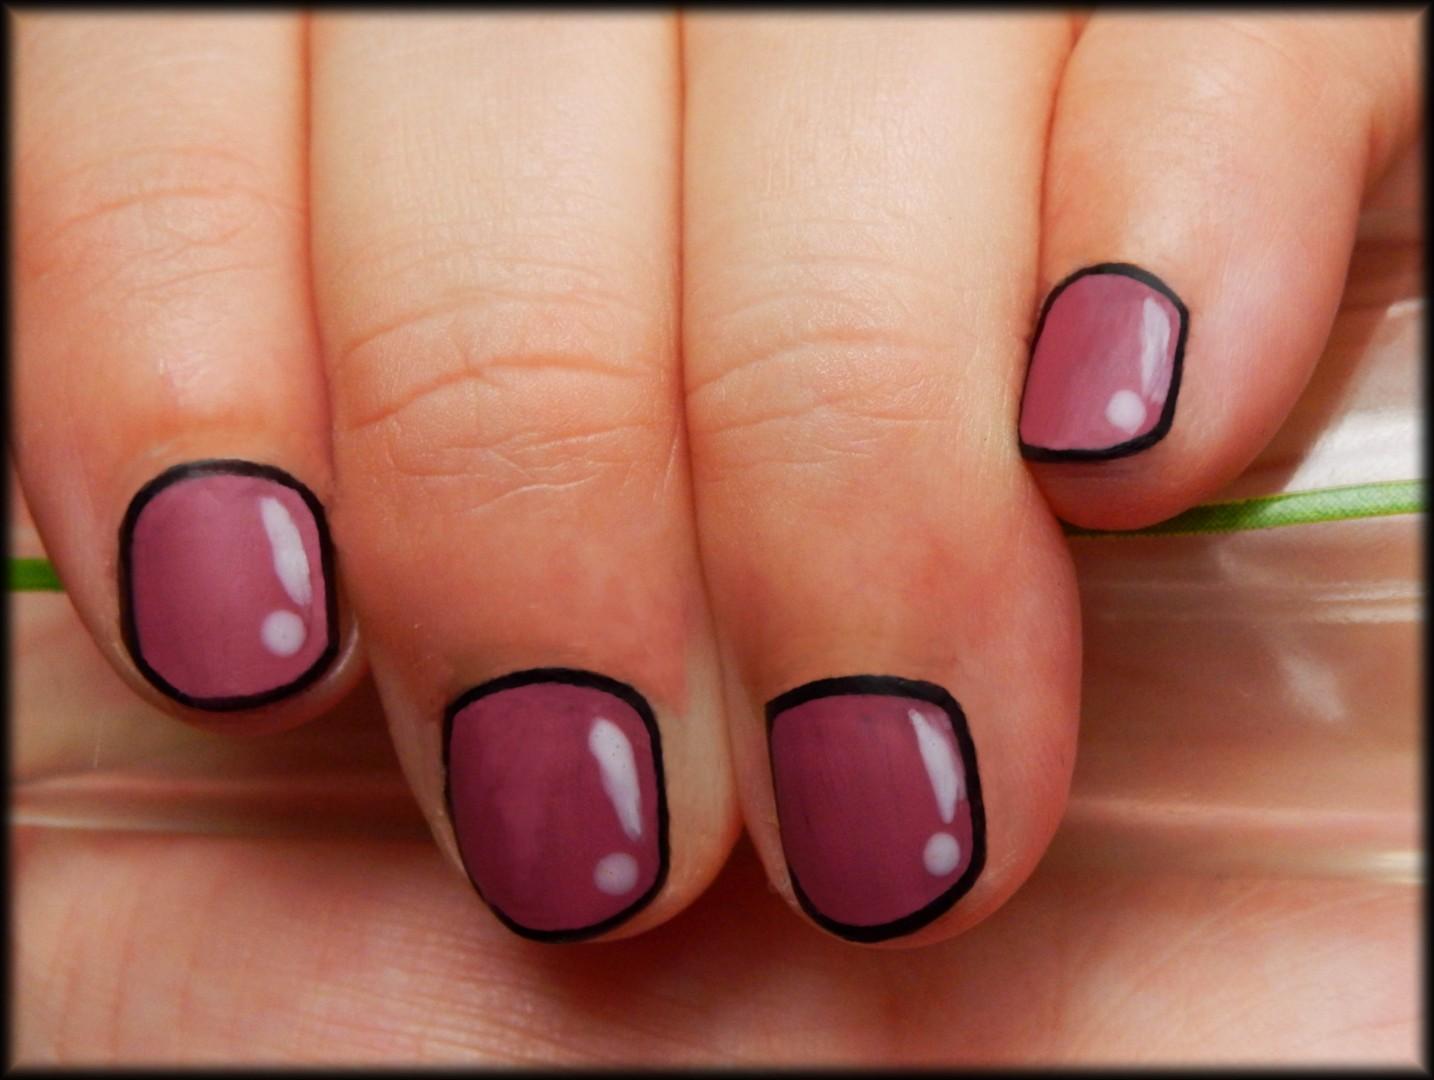 Animated Deep Pink Short Nails - FMag.com